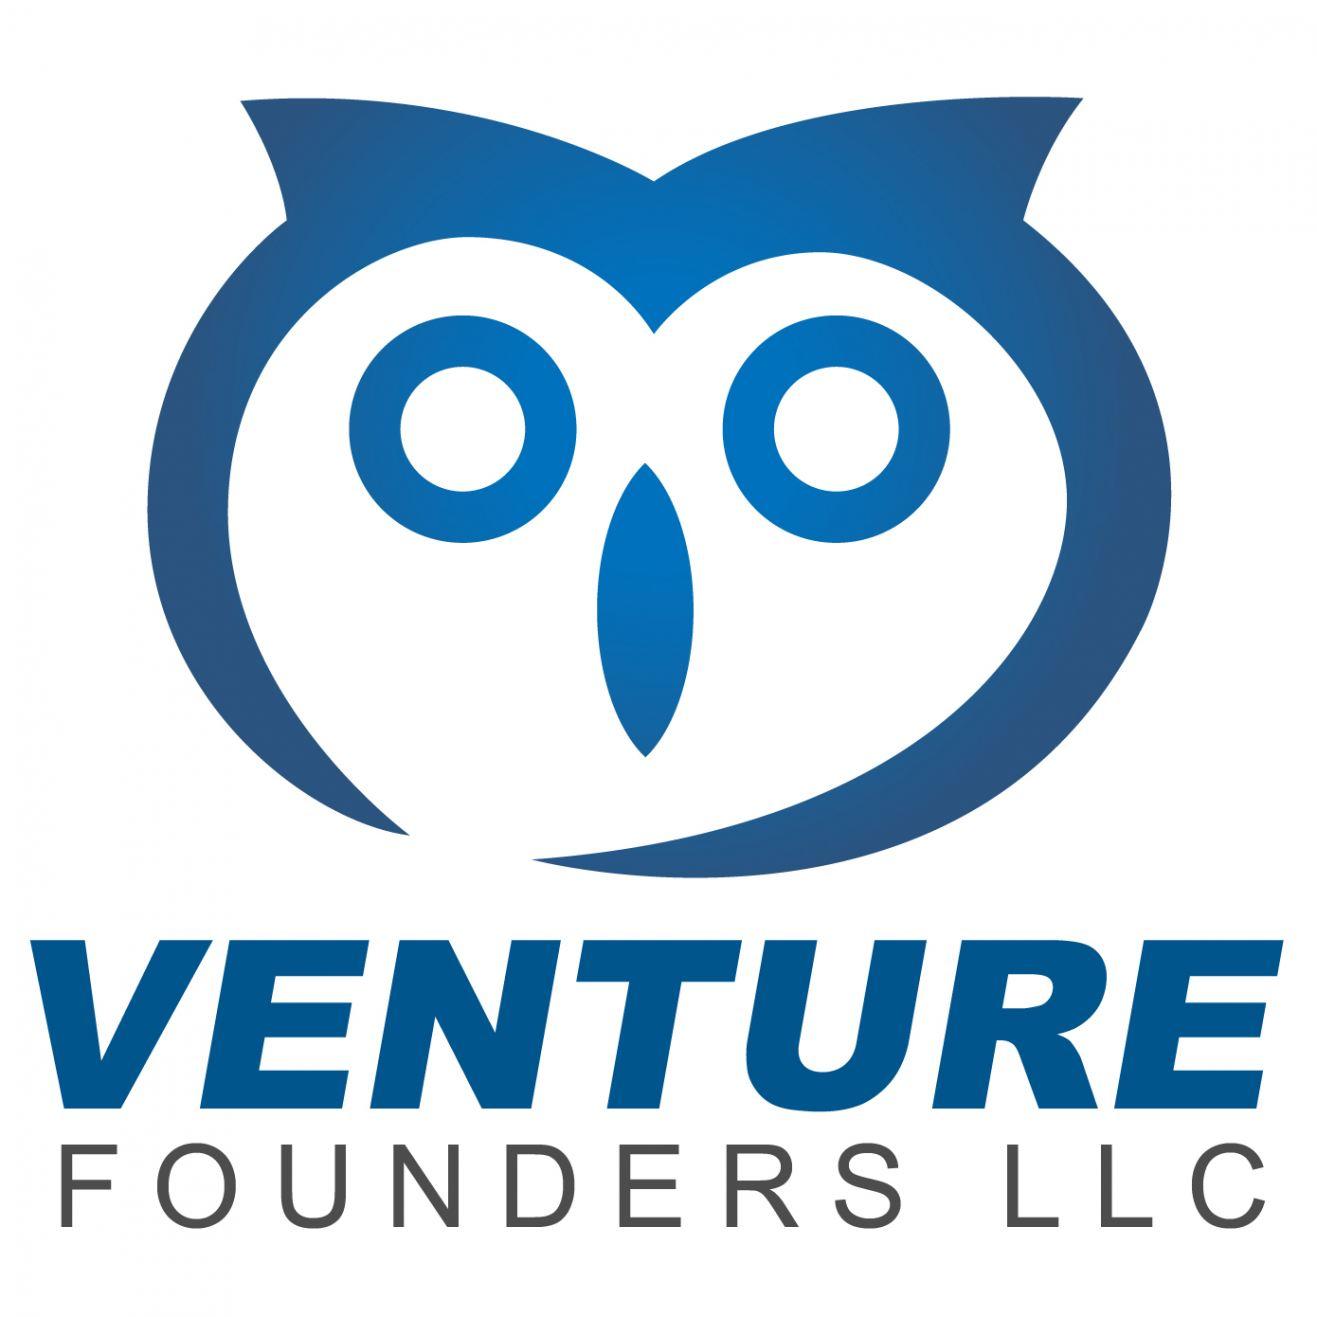 venturefounders Logo